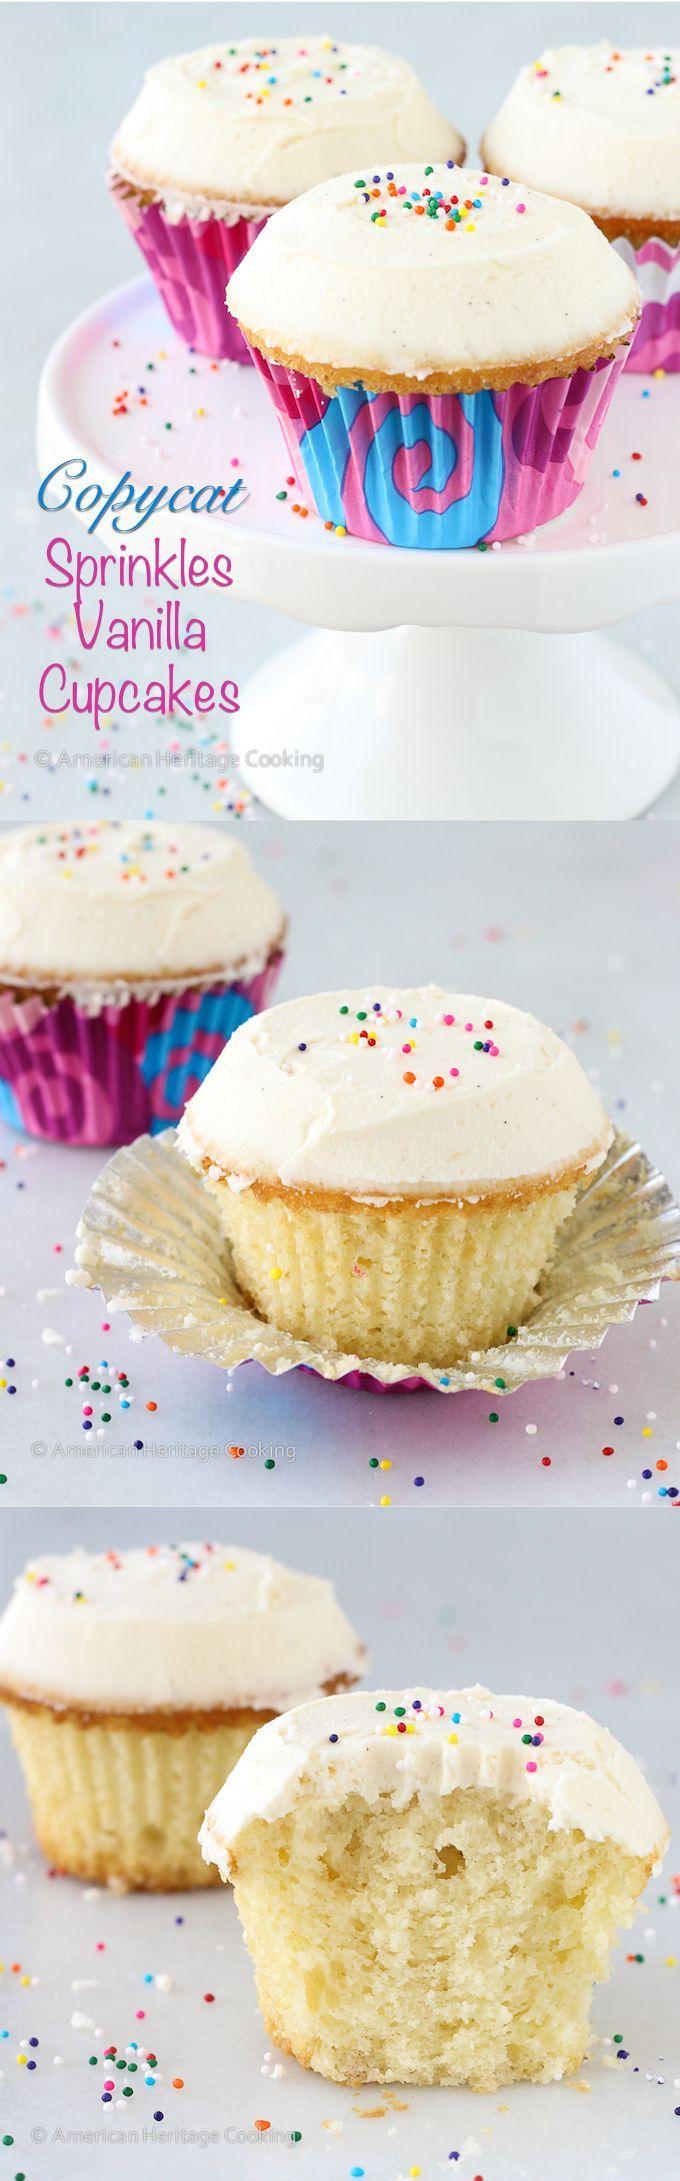 52 best Copycat cakes images on Pinterest | Dessert recipes, Desert ...